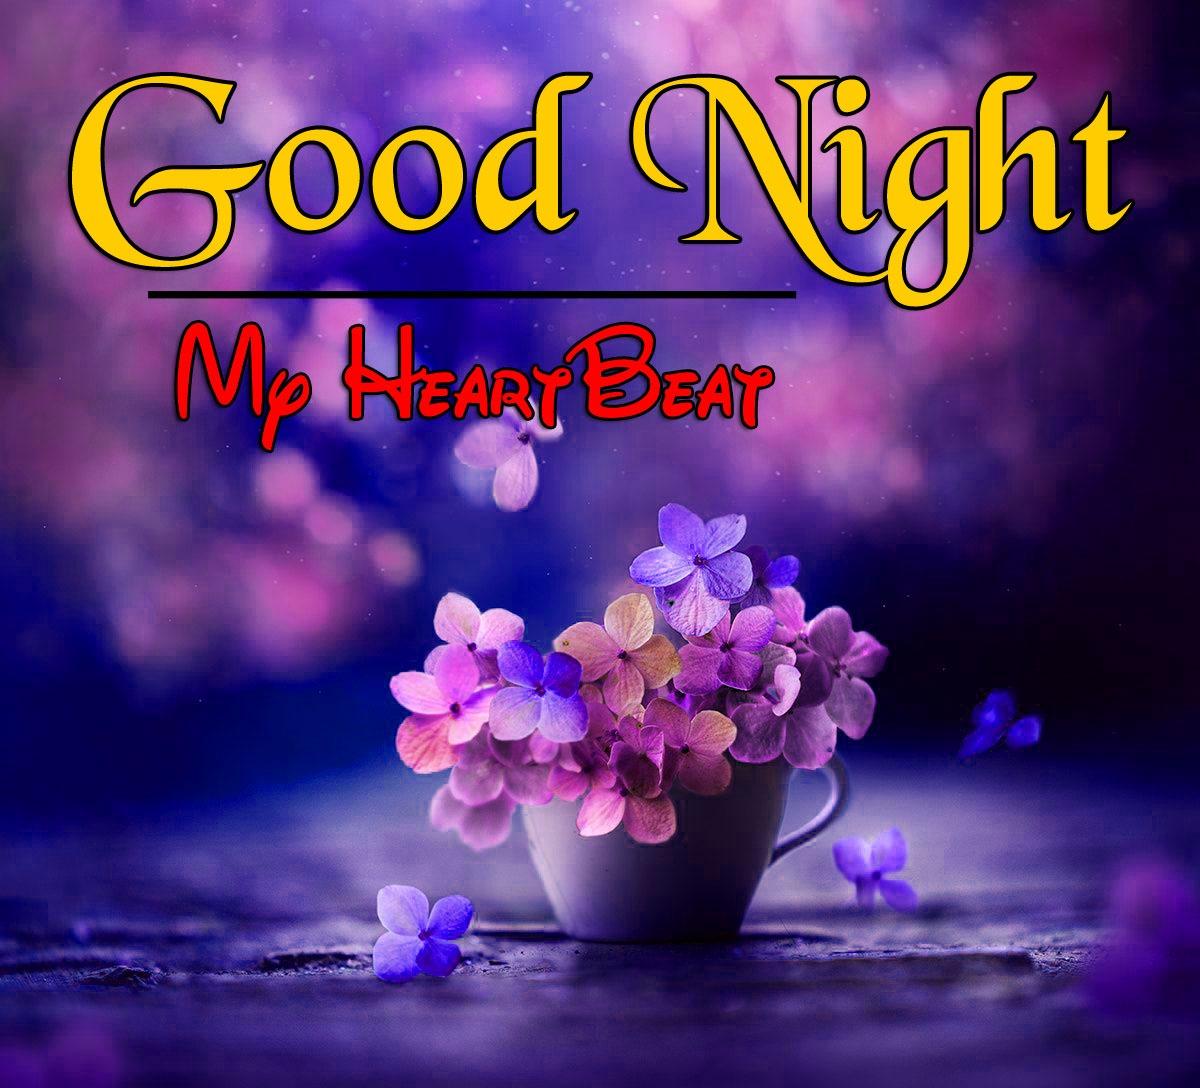 Good Night Pics For Whatsapp